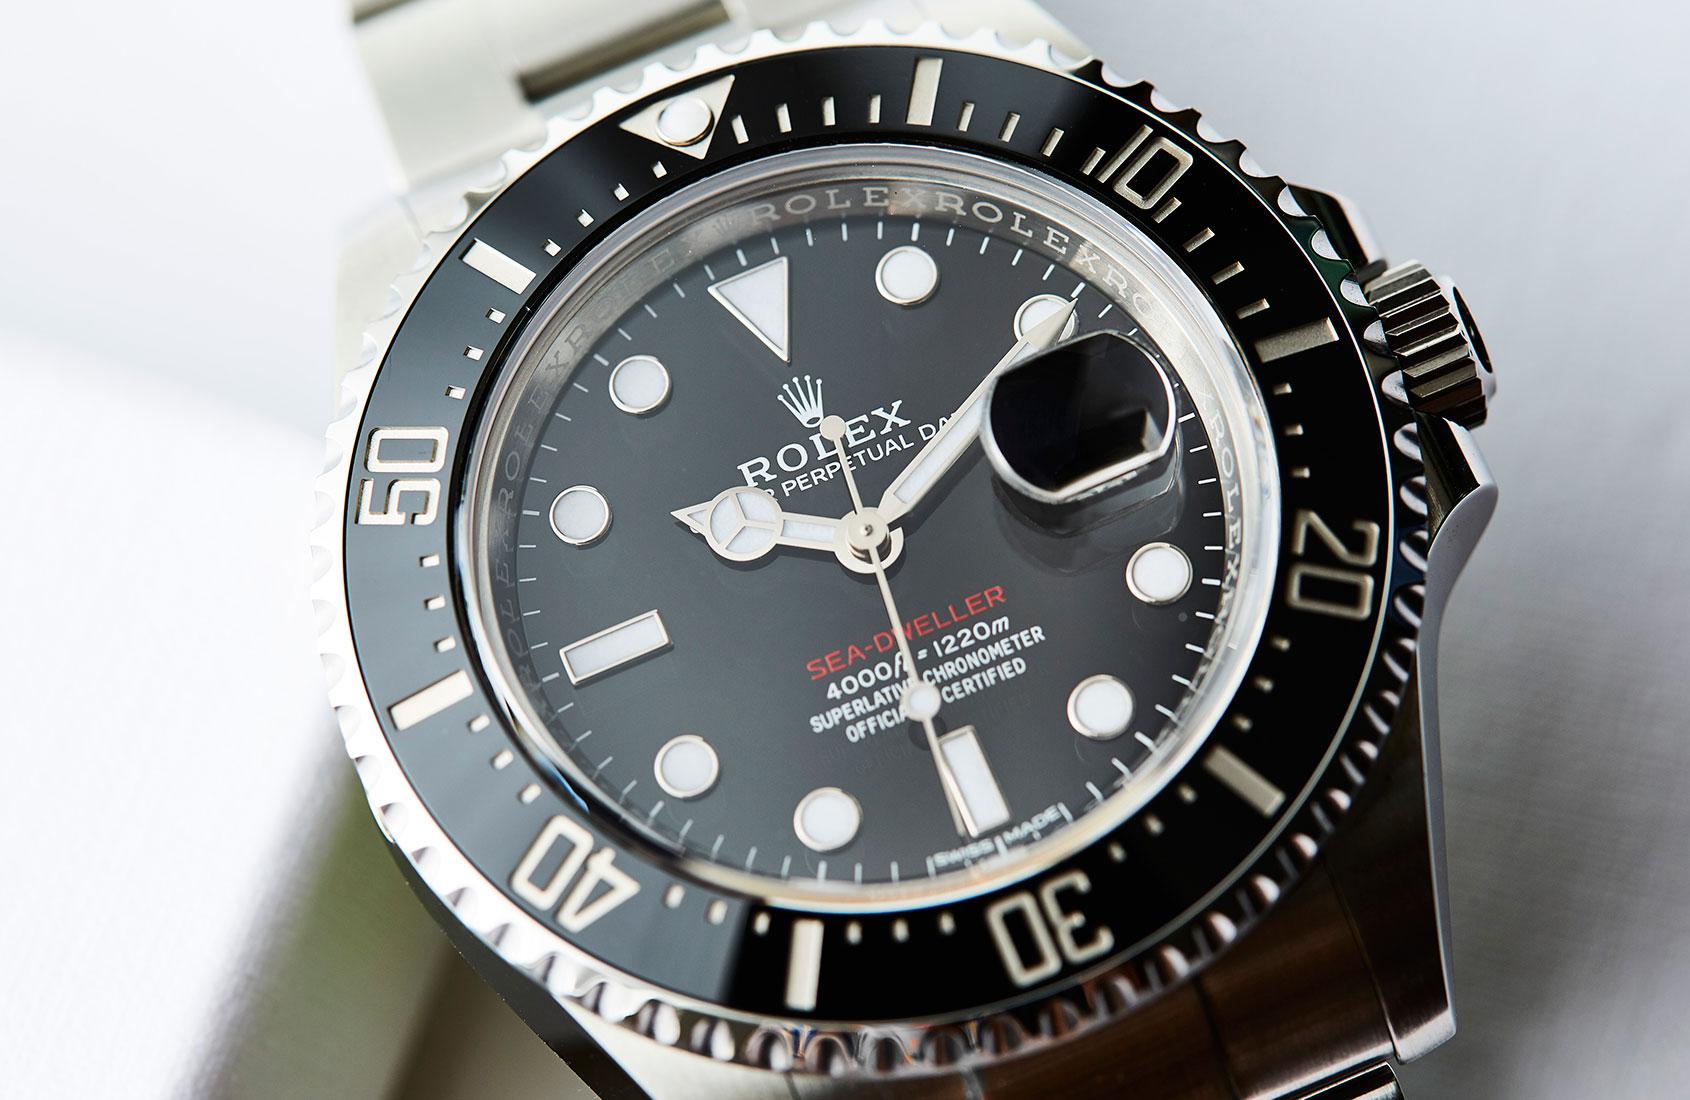 Rolex sea dweller ref 126600 hands on review for Rolex sea wweller